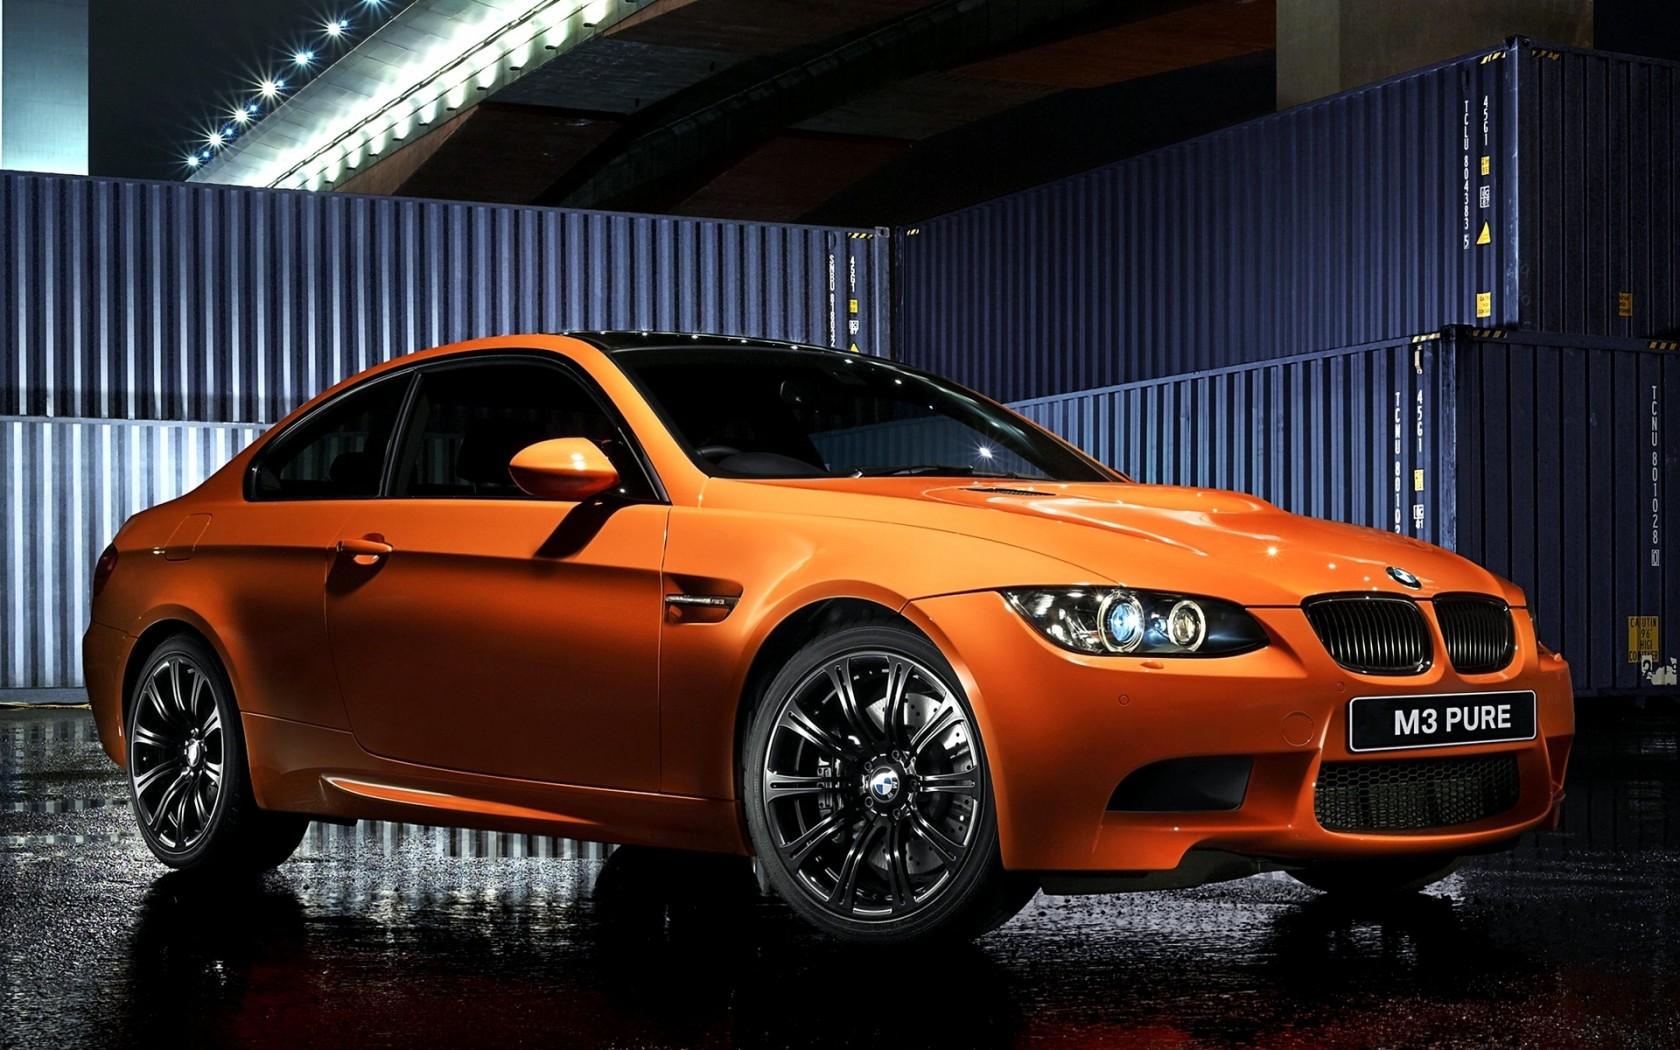 Bmw 325ci M Sport Edition E46 Wallpapers Car Wallpapers Hd: BMW M3 Wallpaper HD Widescreen